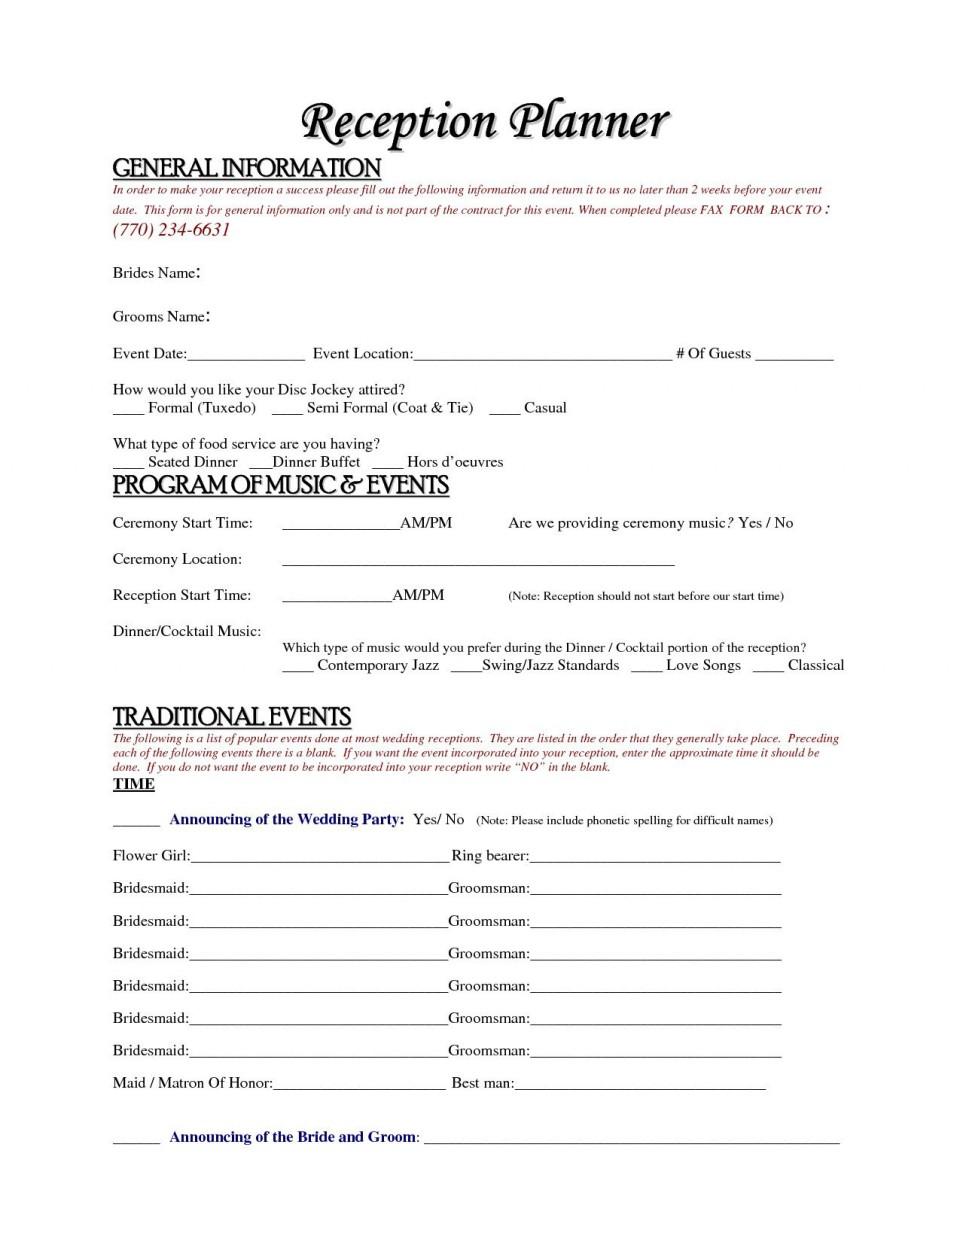 004 Simple Wedding Planner Contract Template Idea  Uk Australia960